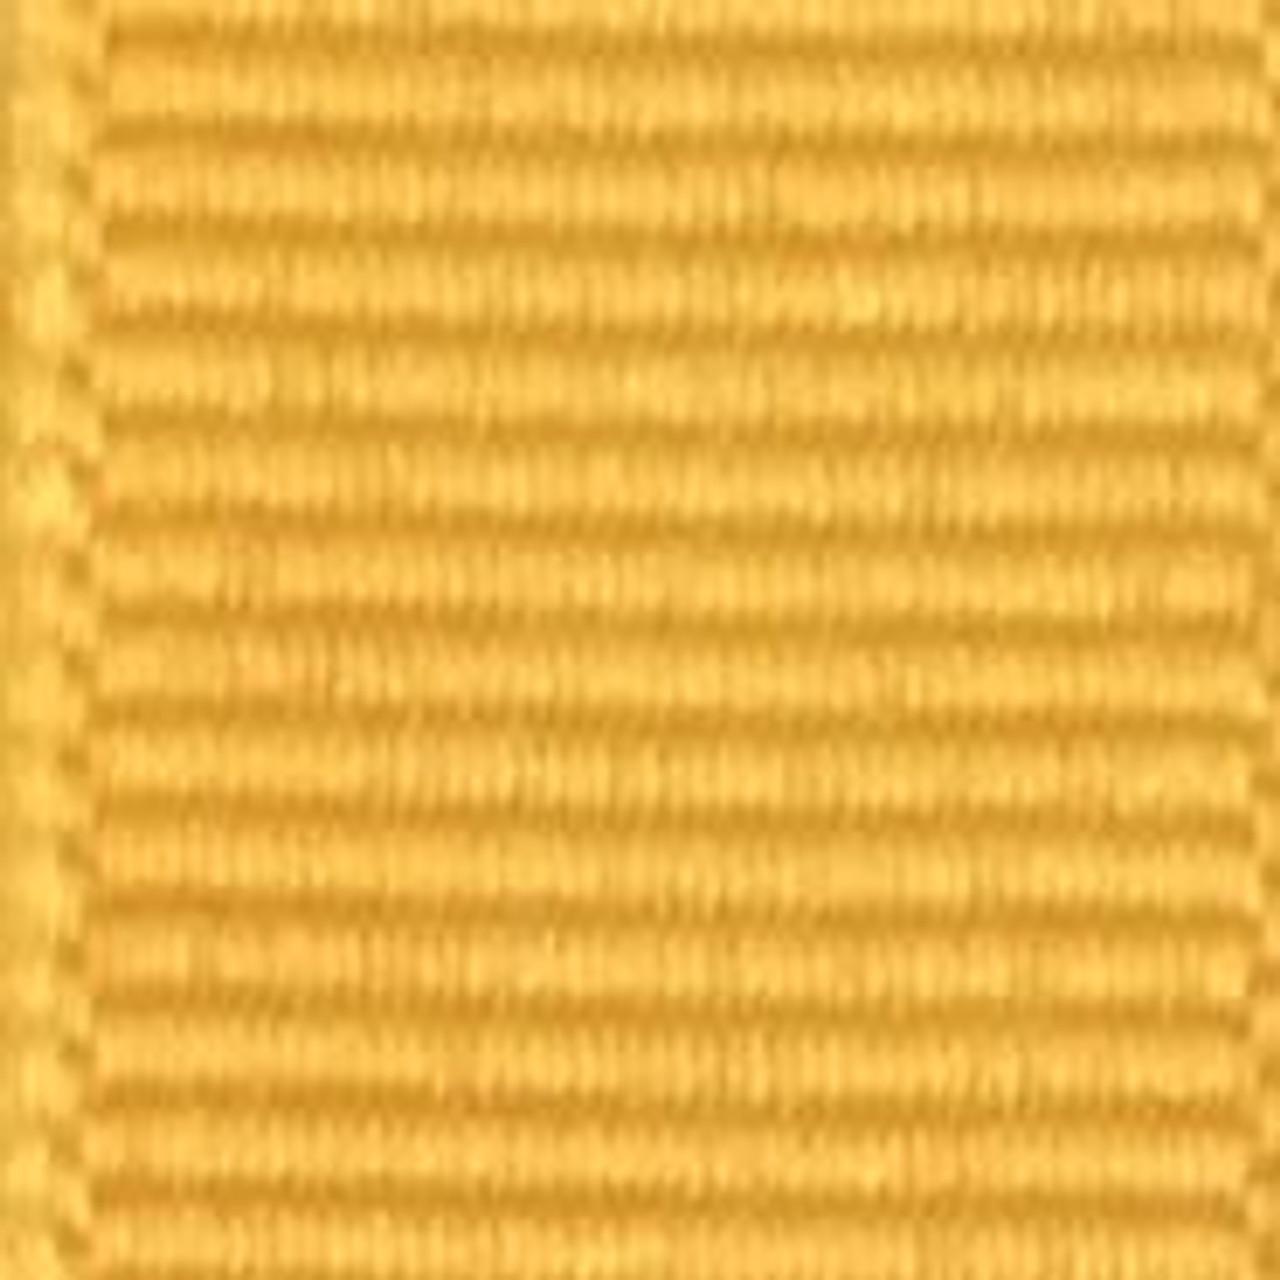 Yellow Gold Solid Grosgrain Ribbon